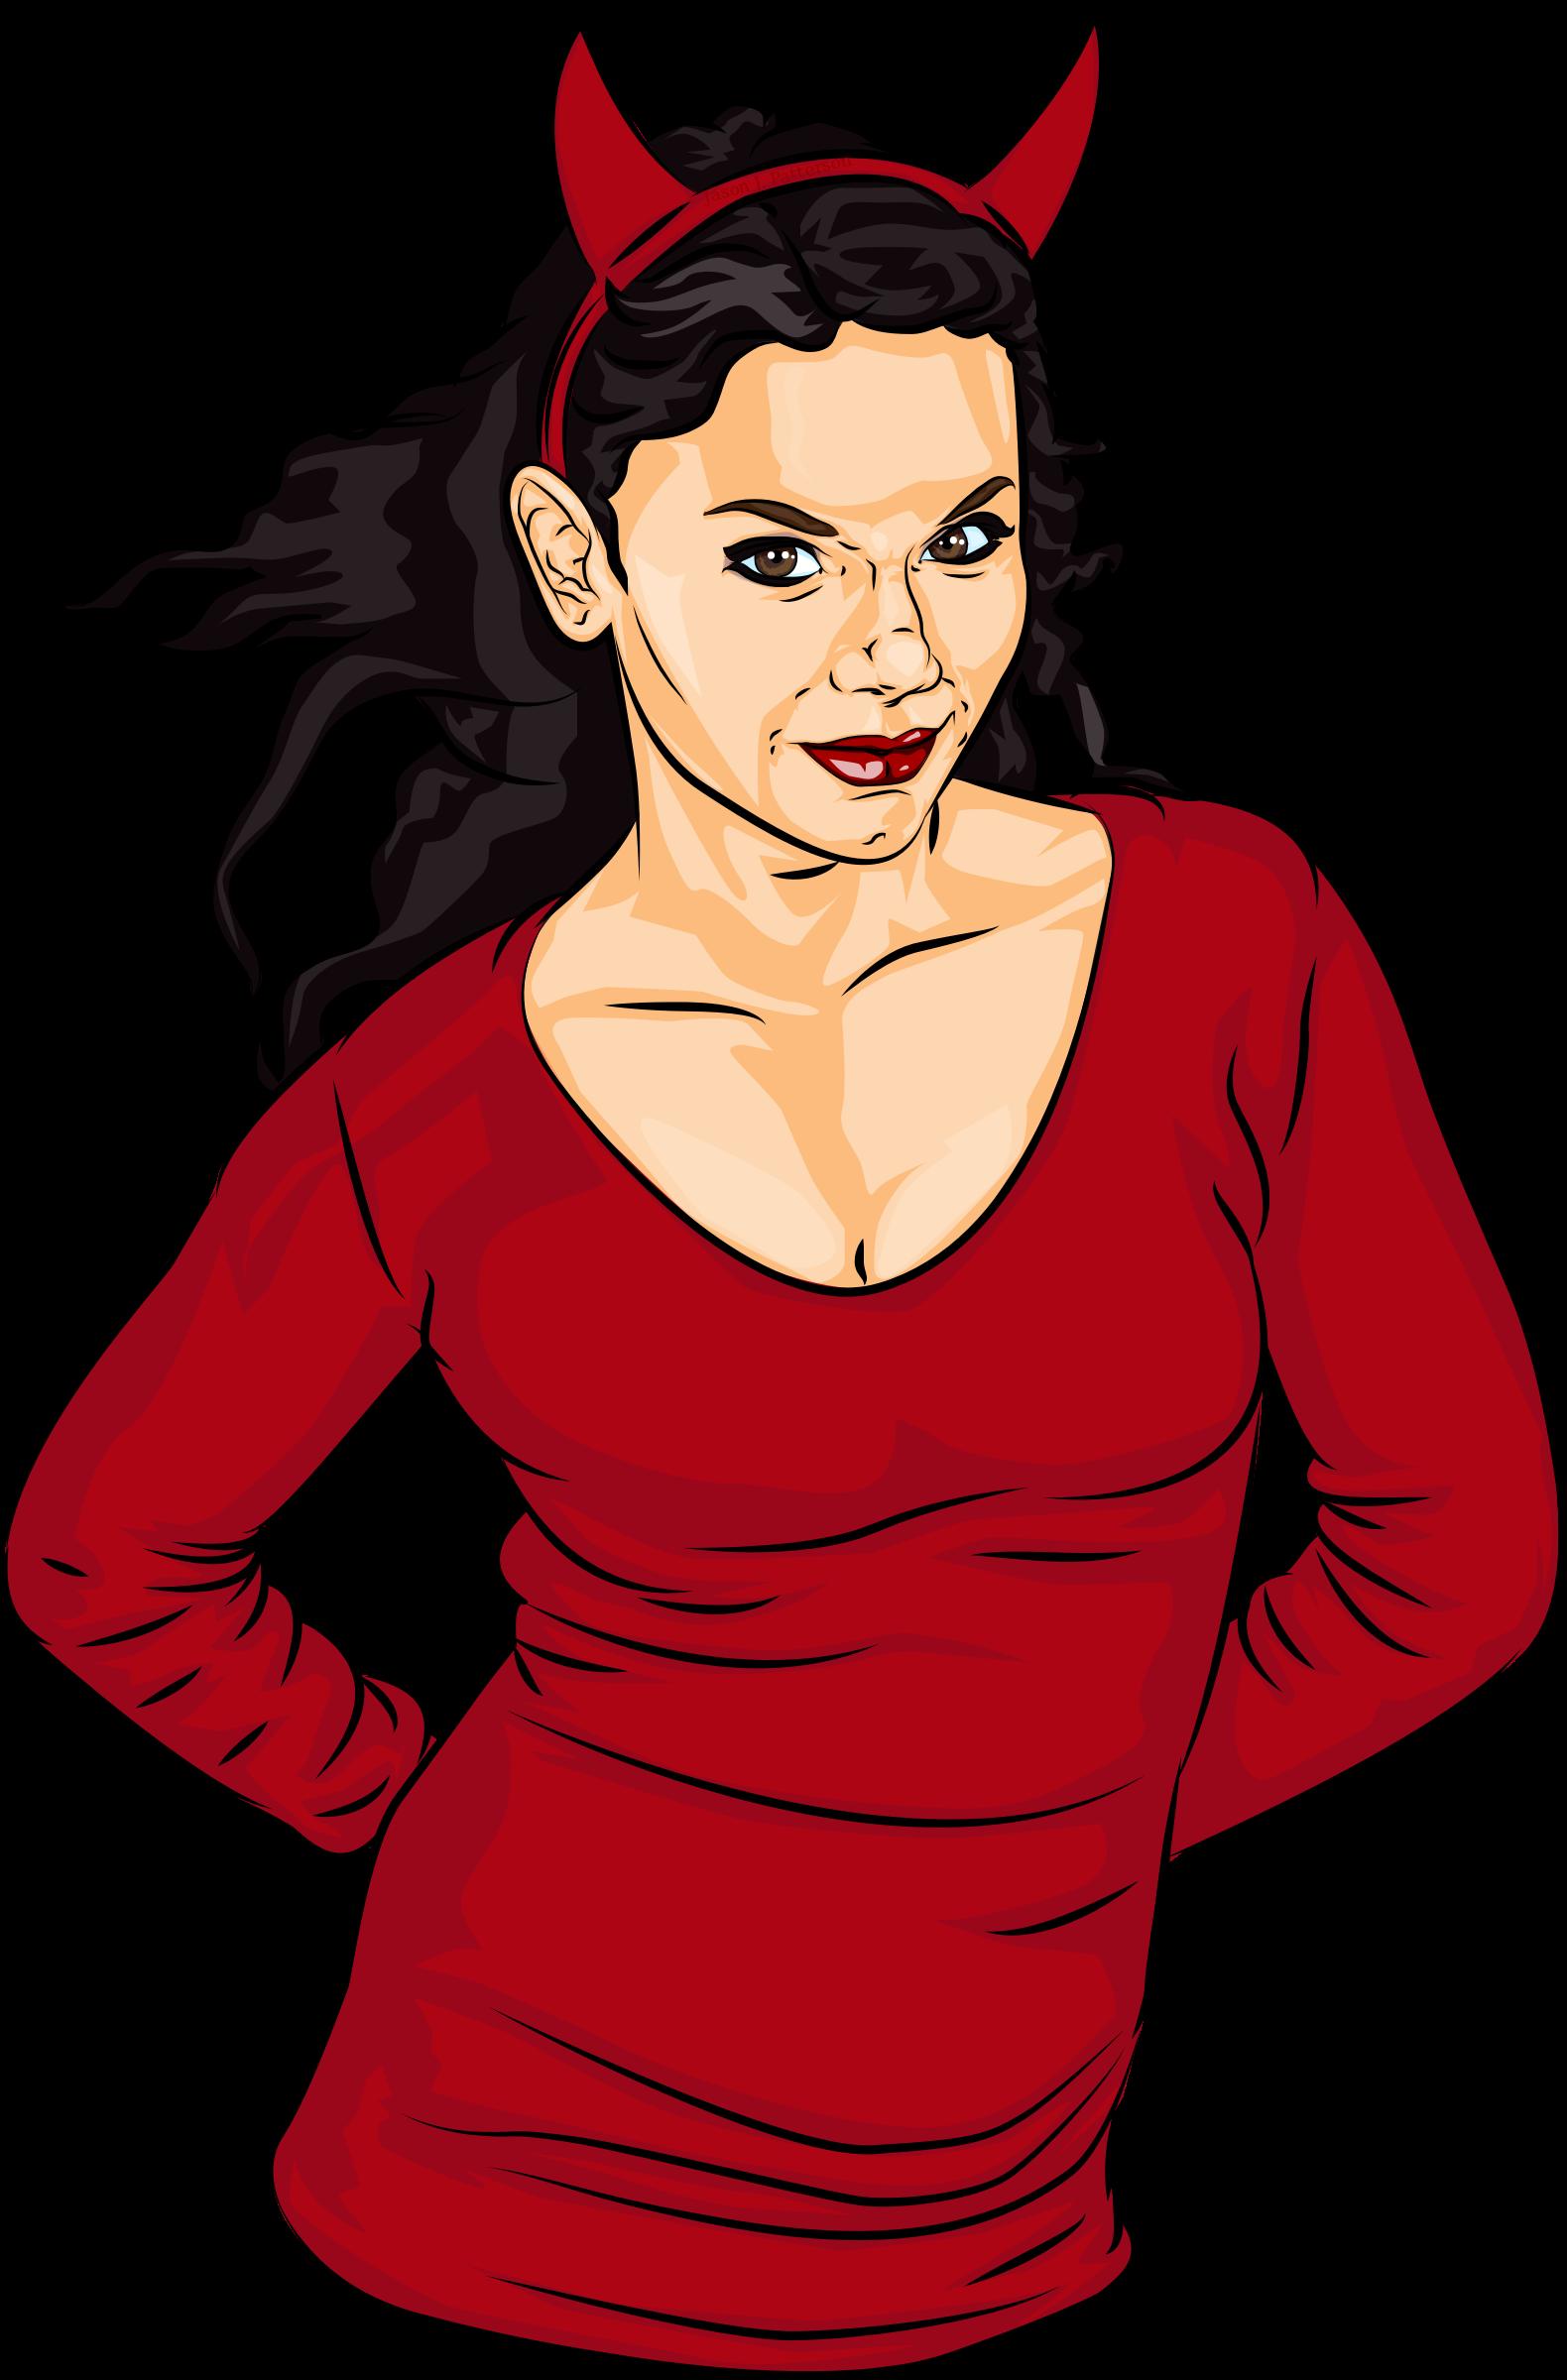 Devil Girl Vector Clipart image - Free stock photo ...